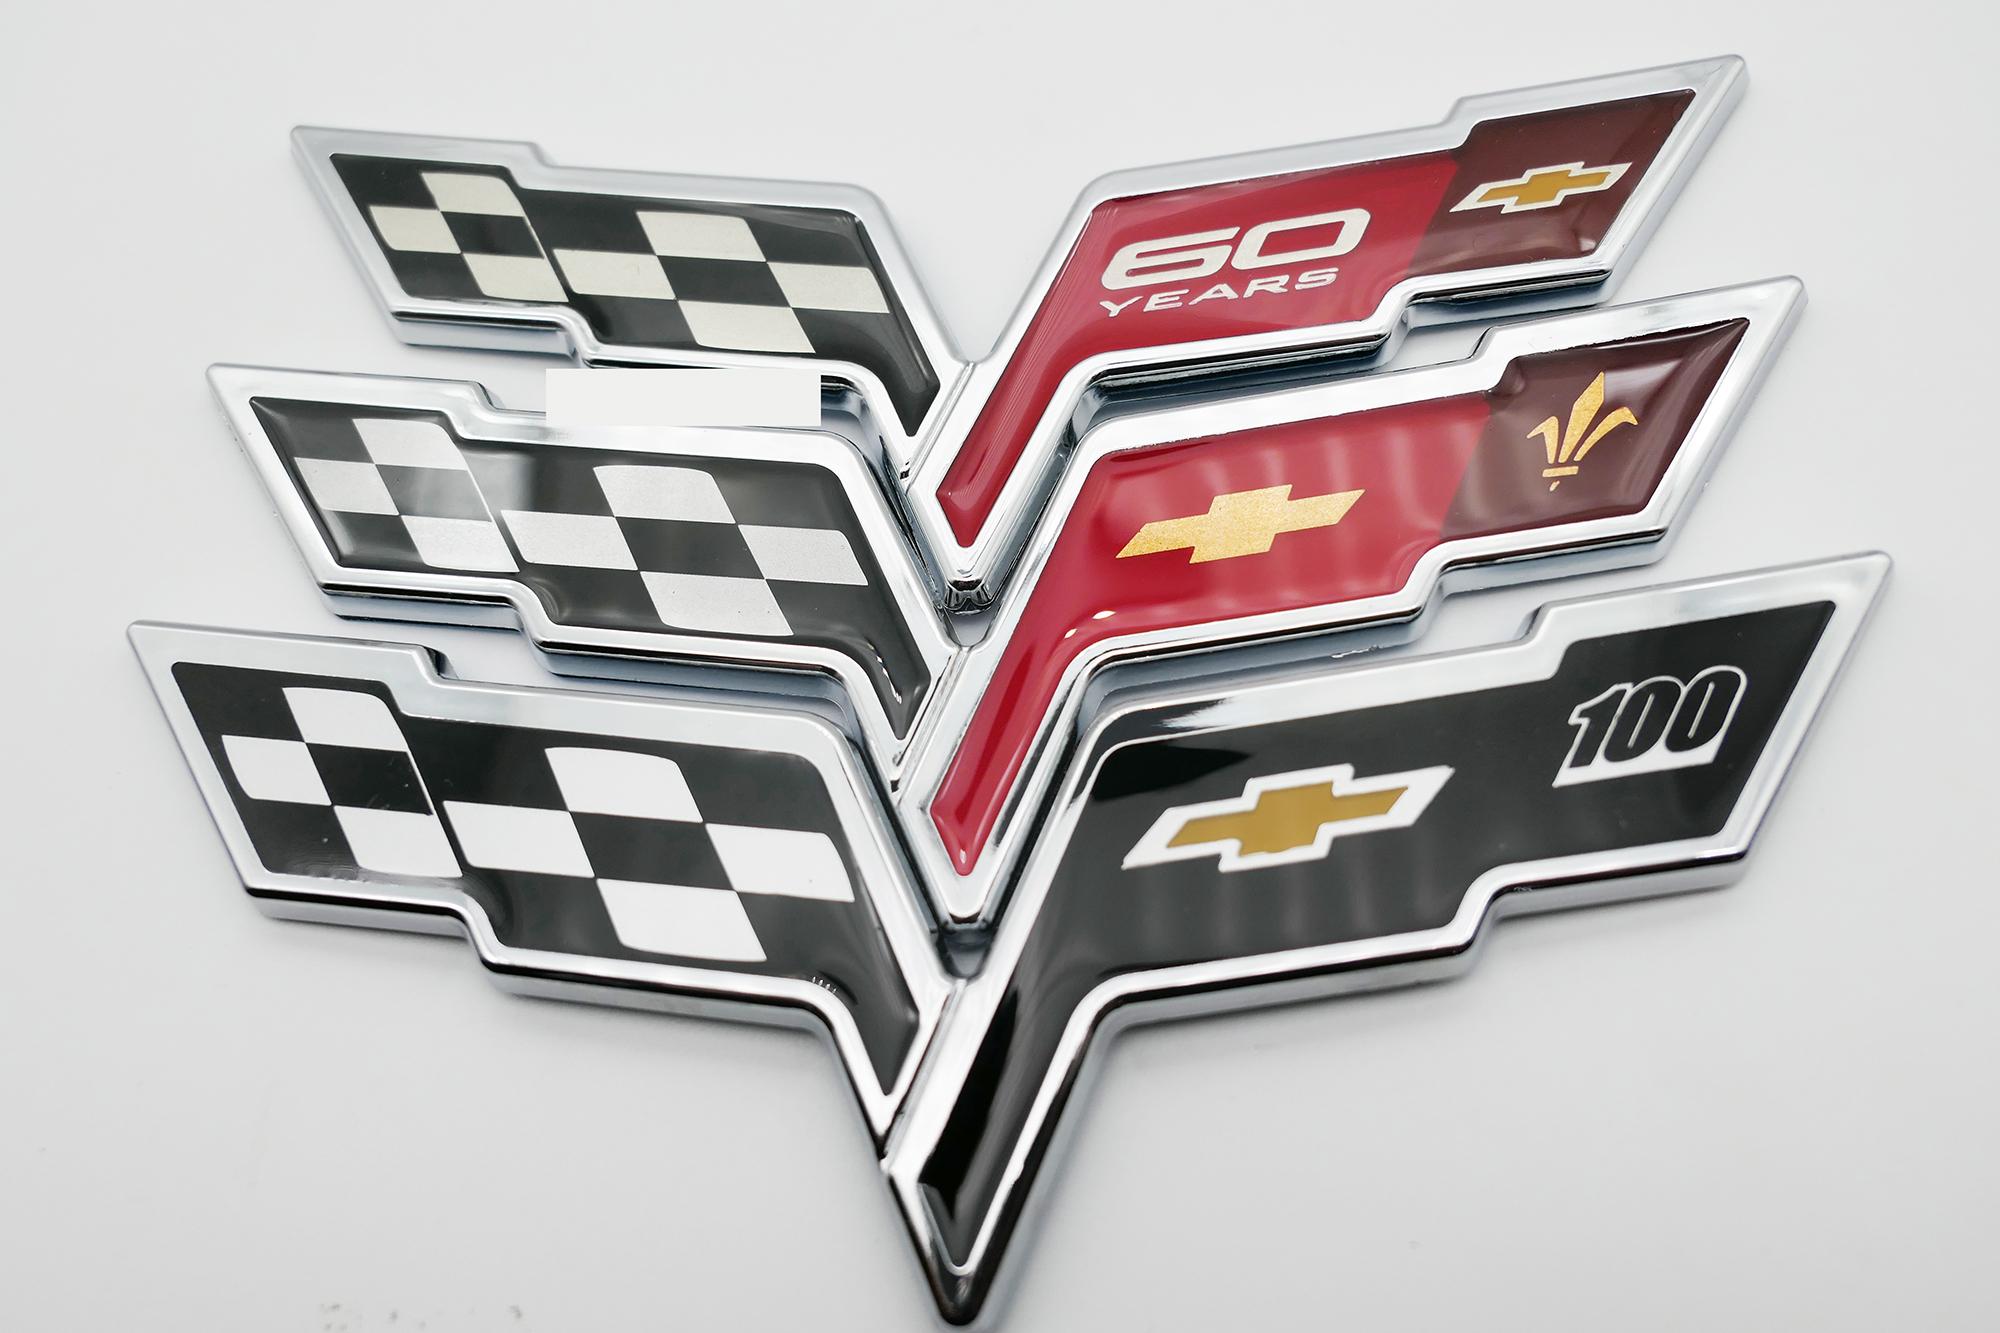 Chevy Camaro Silverado Corvette Flag LSX Body Fender Rear Emblem Badge Sticker